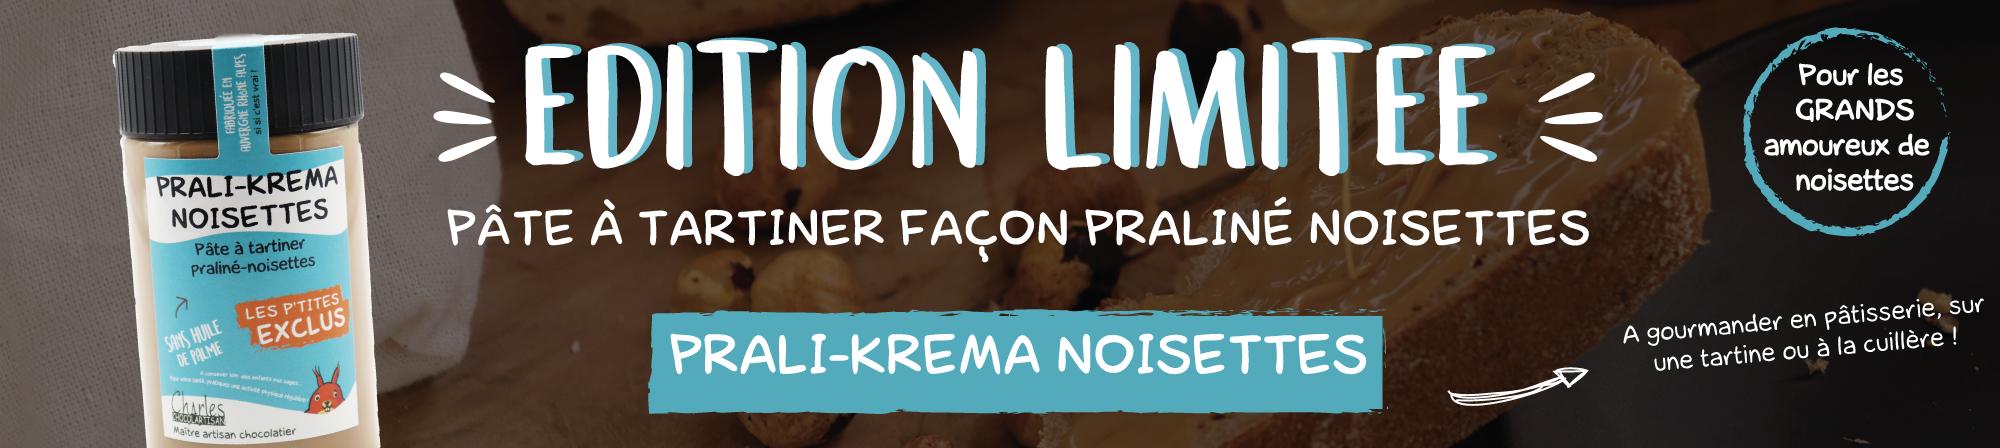 Edition limitée - Prali-Krema Noisettes